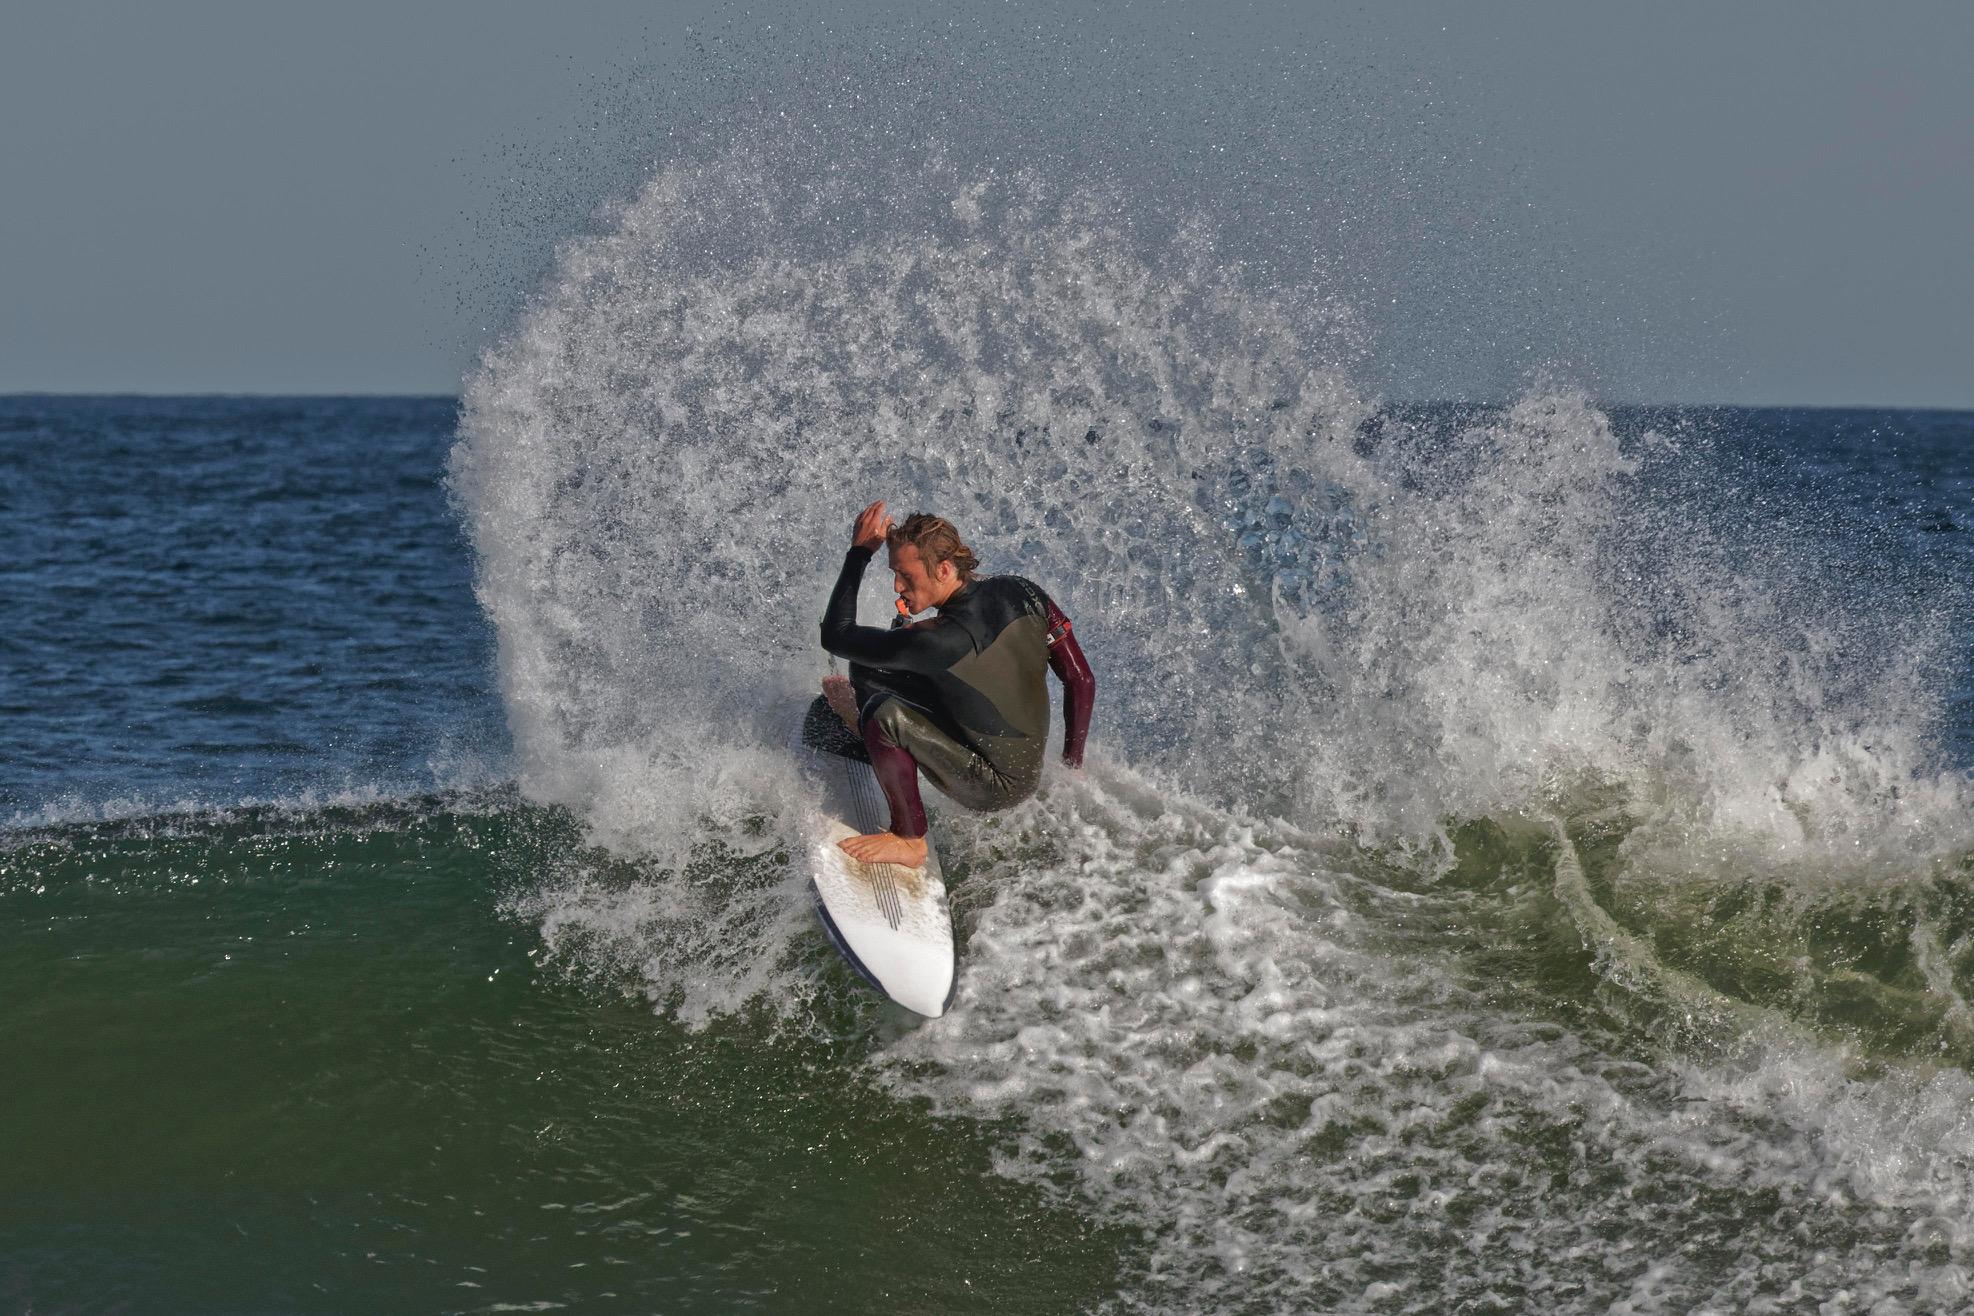 Surfer Picture by Jett Harris